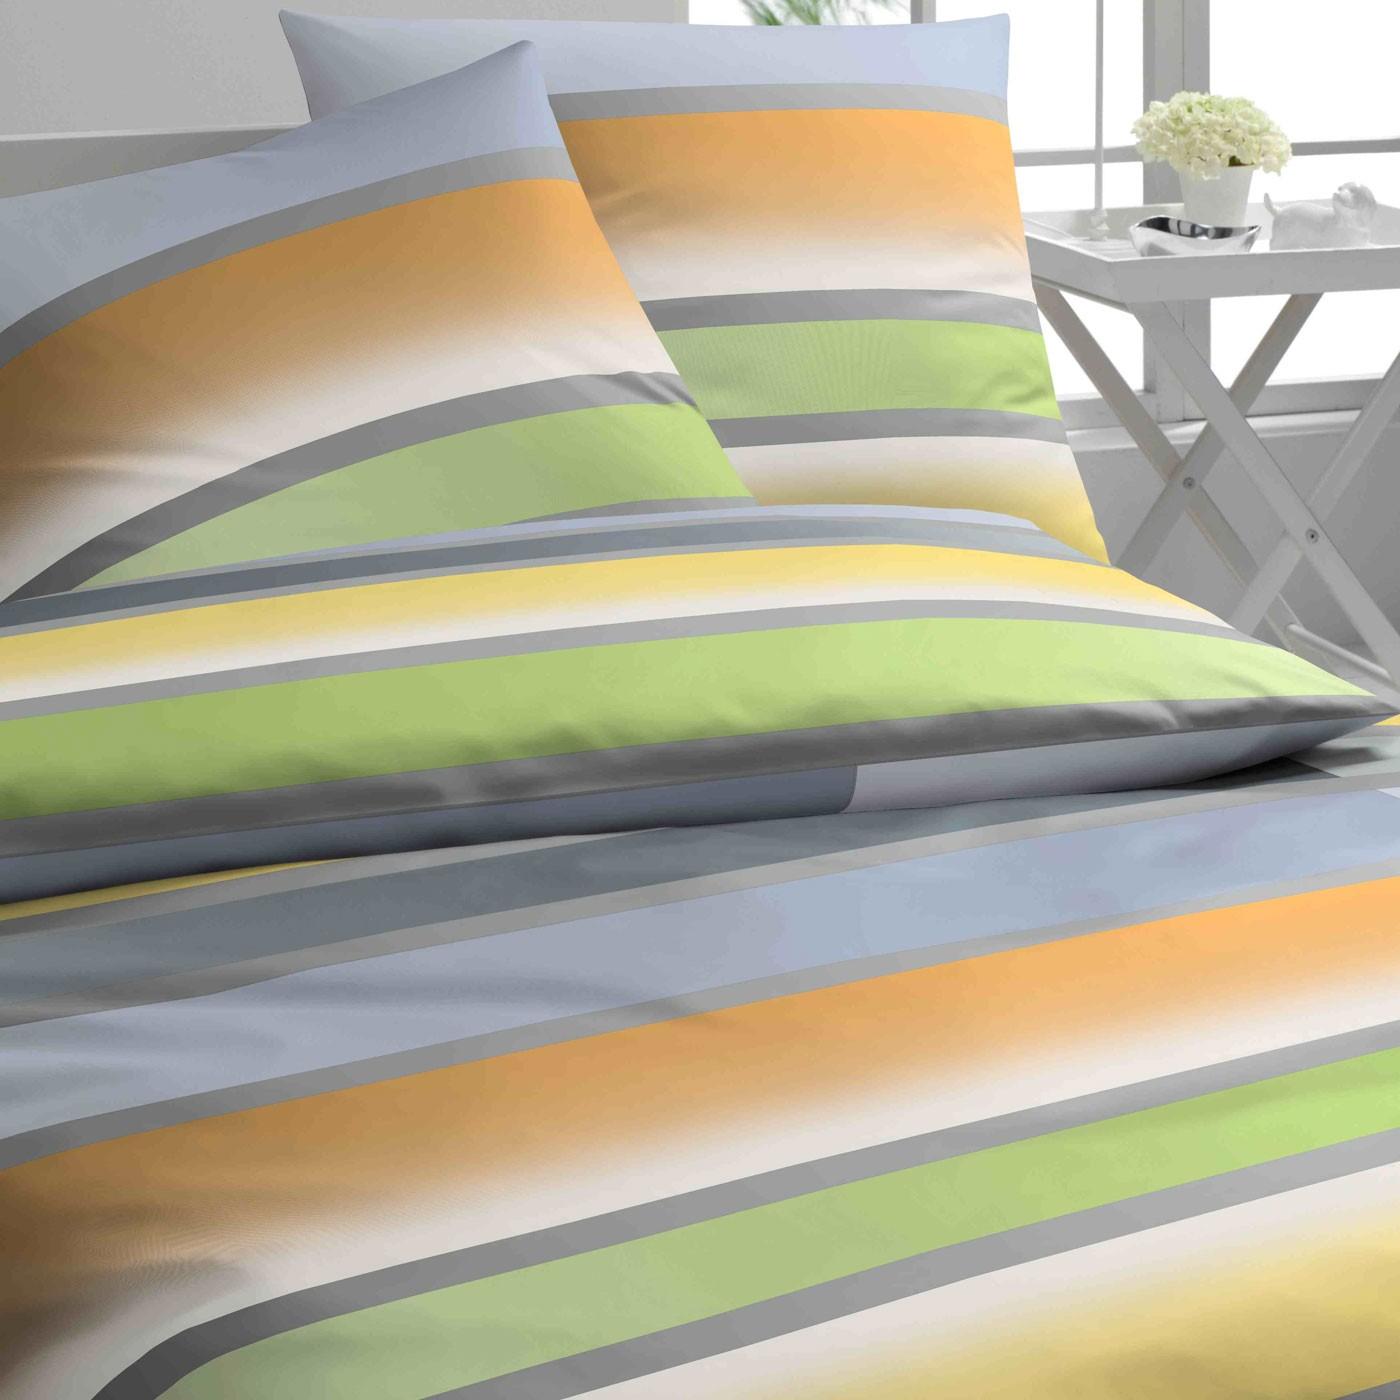 bettw sche yes for bed ziro 1444 gr n. Black Bedroom Furniture Sets. Home Design Ideas